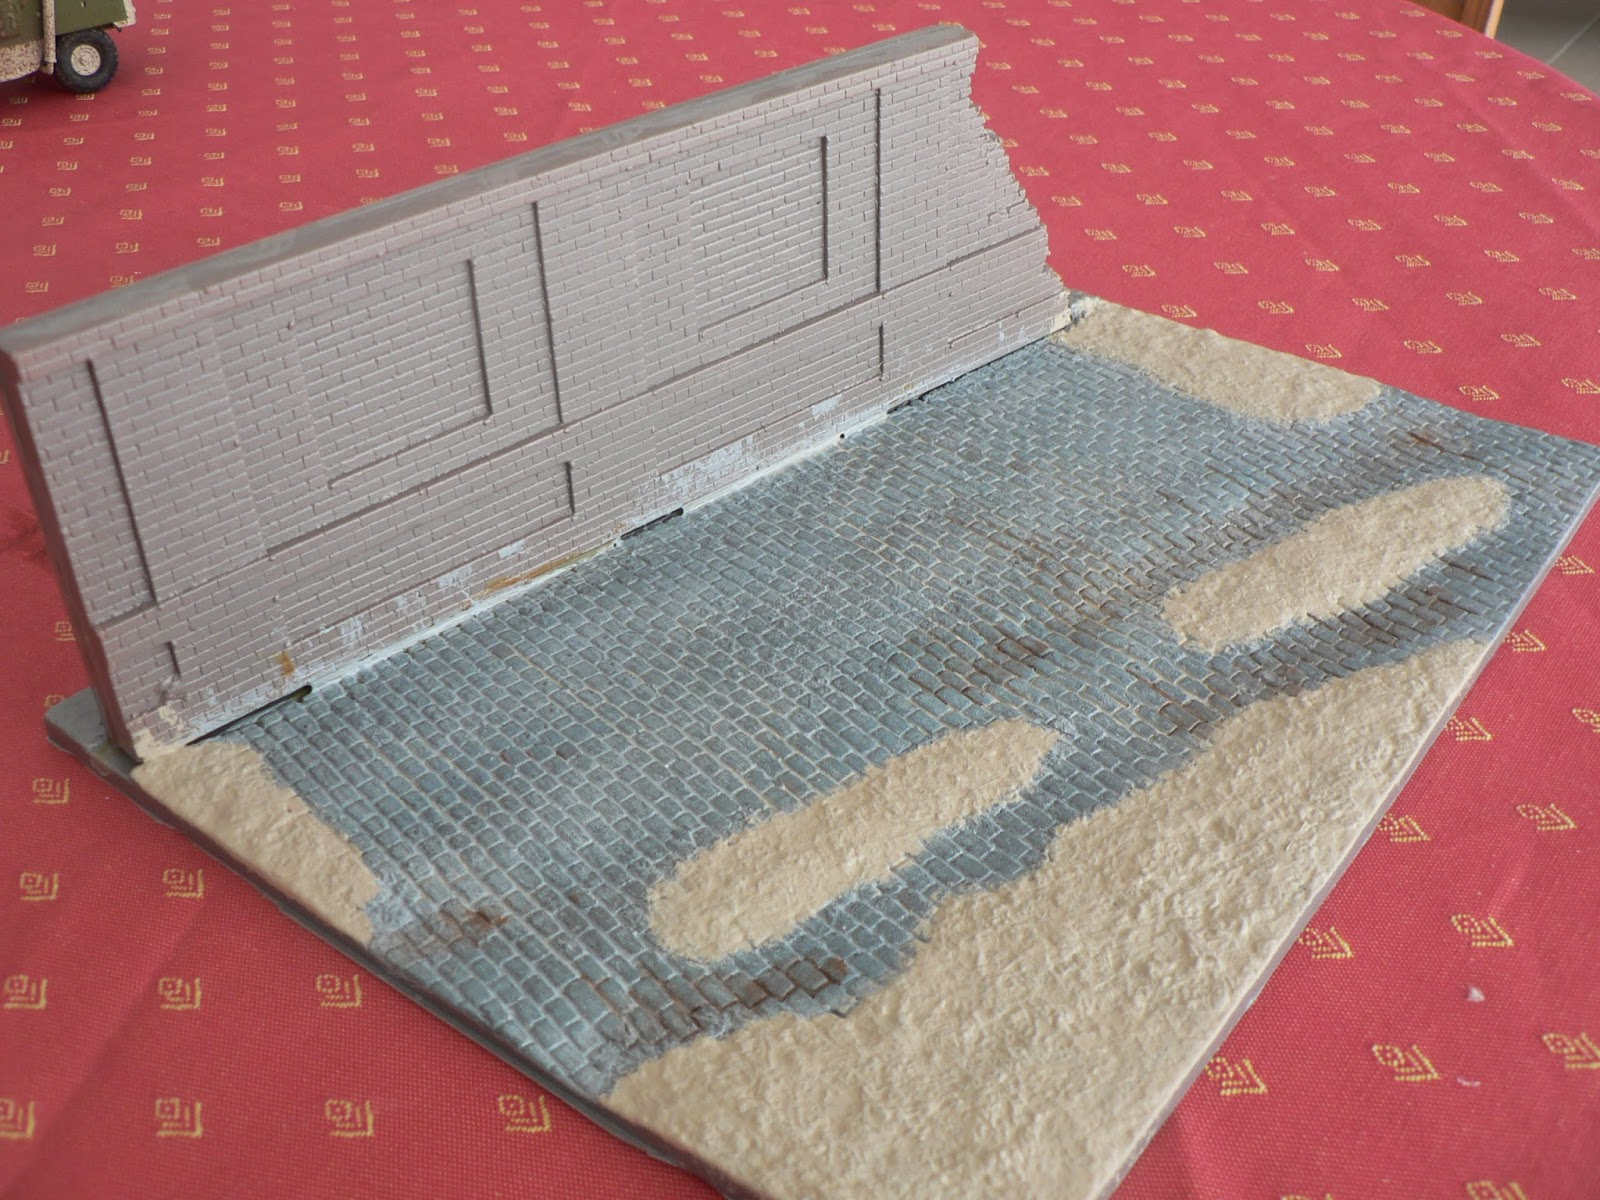 Maquettes militaires de martin diorama irak 1 35 - Peindre des paves autobloquants ...